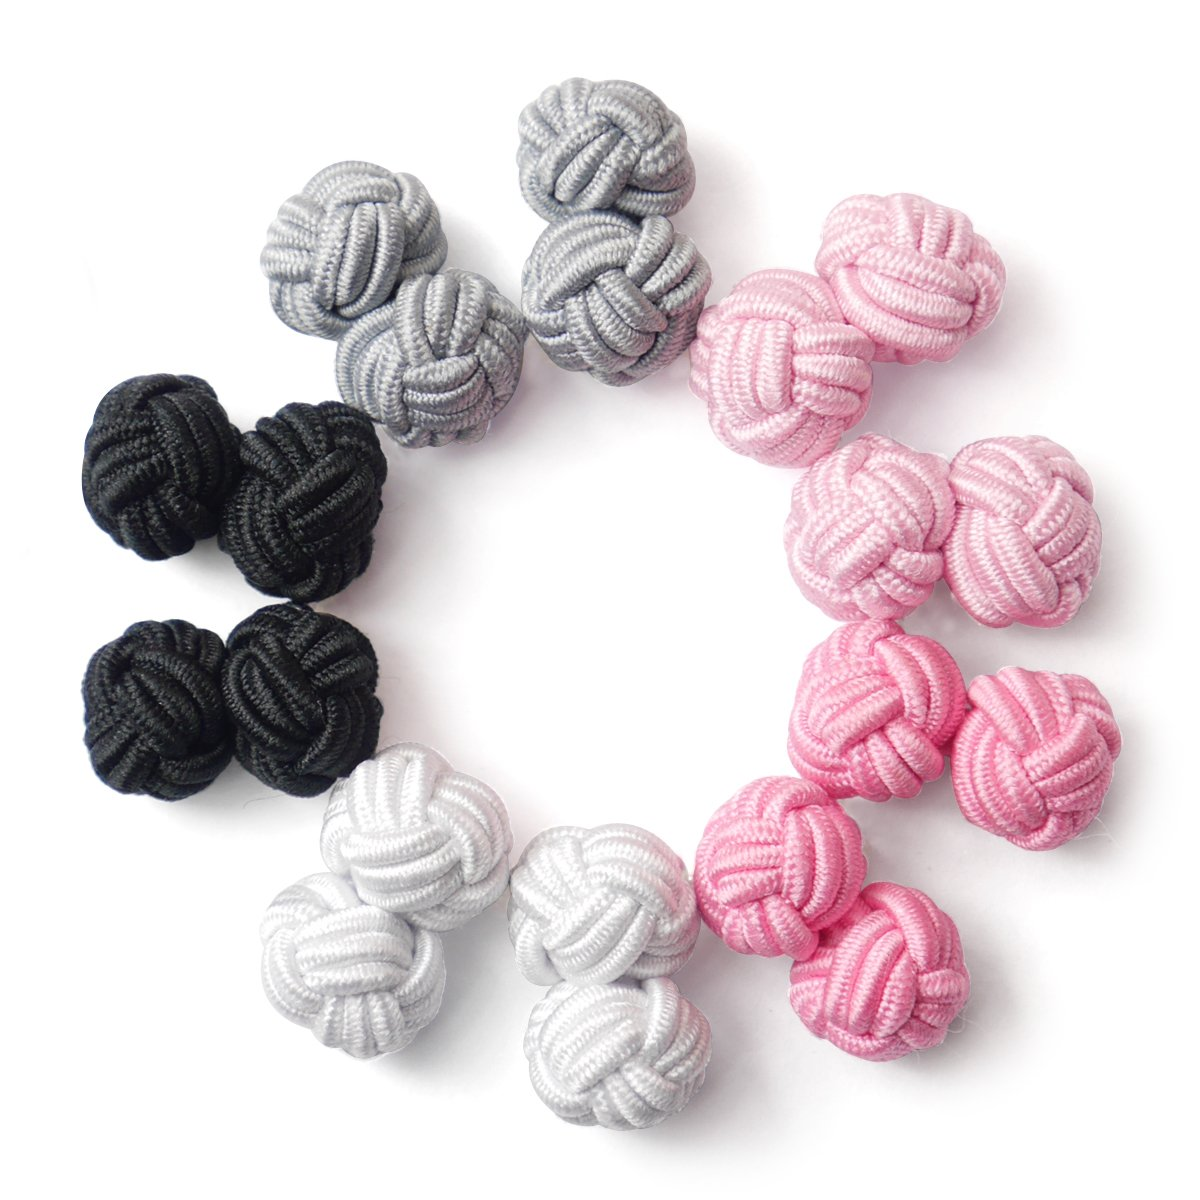 HONEY BEAR Silk Knot Fabric Cufflinks 5 Pairs Set for Mens Shirt Gift